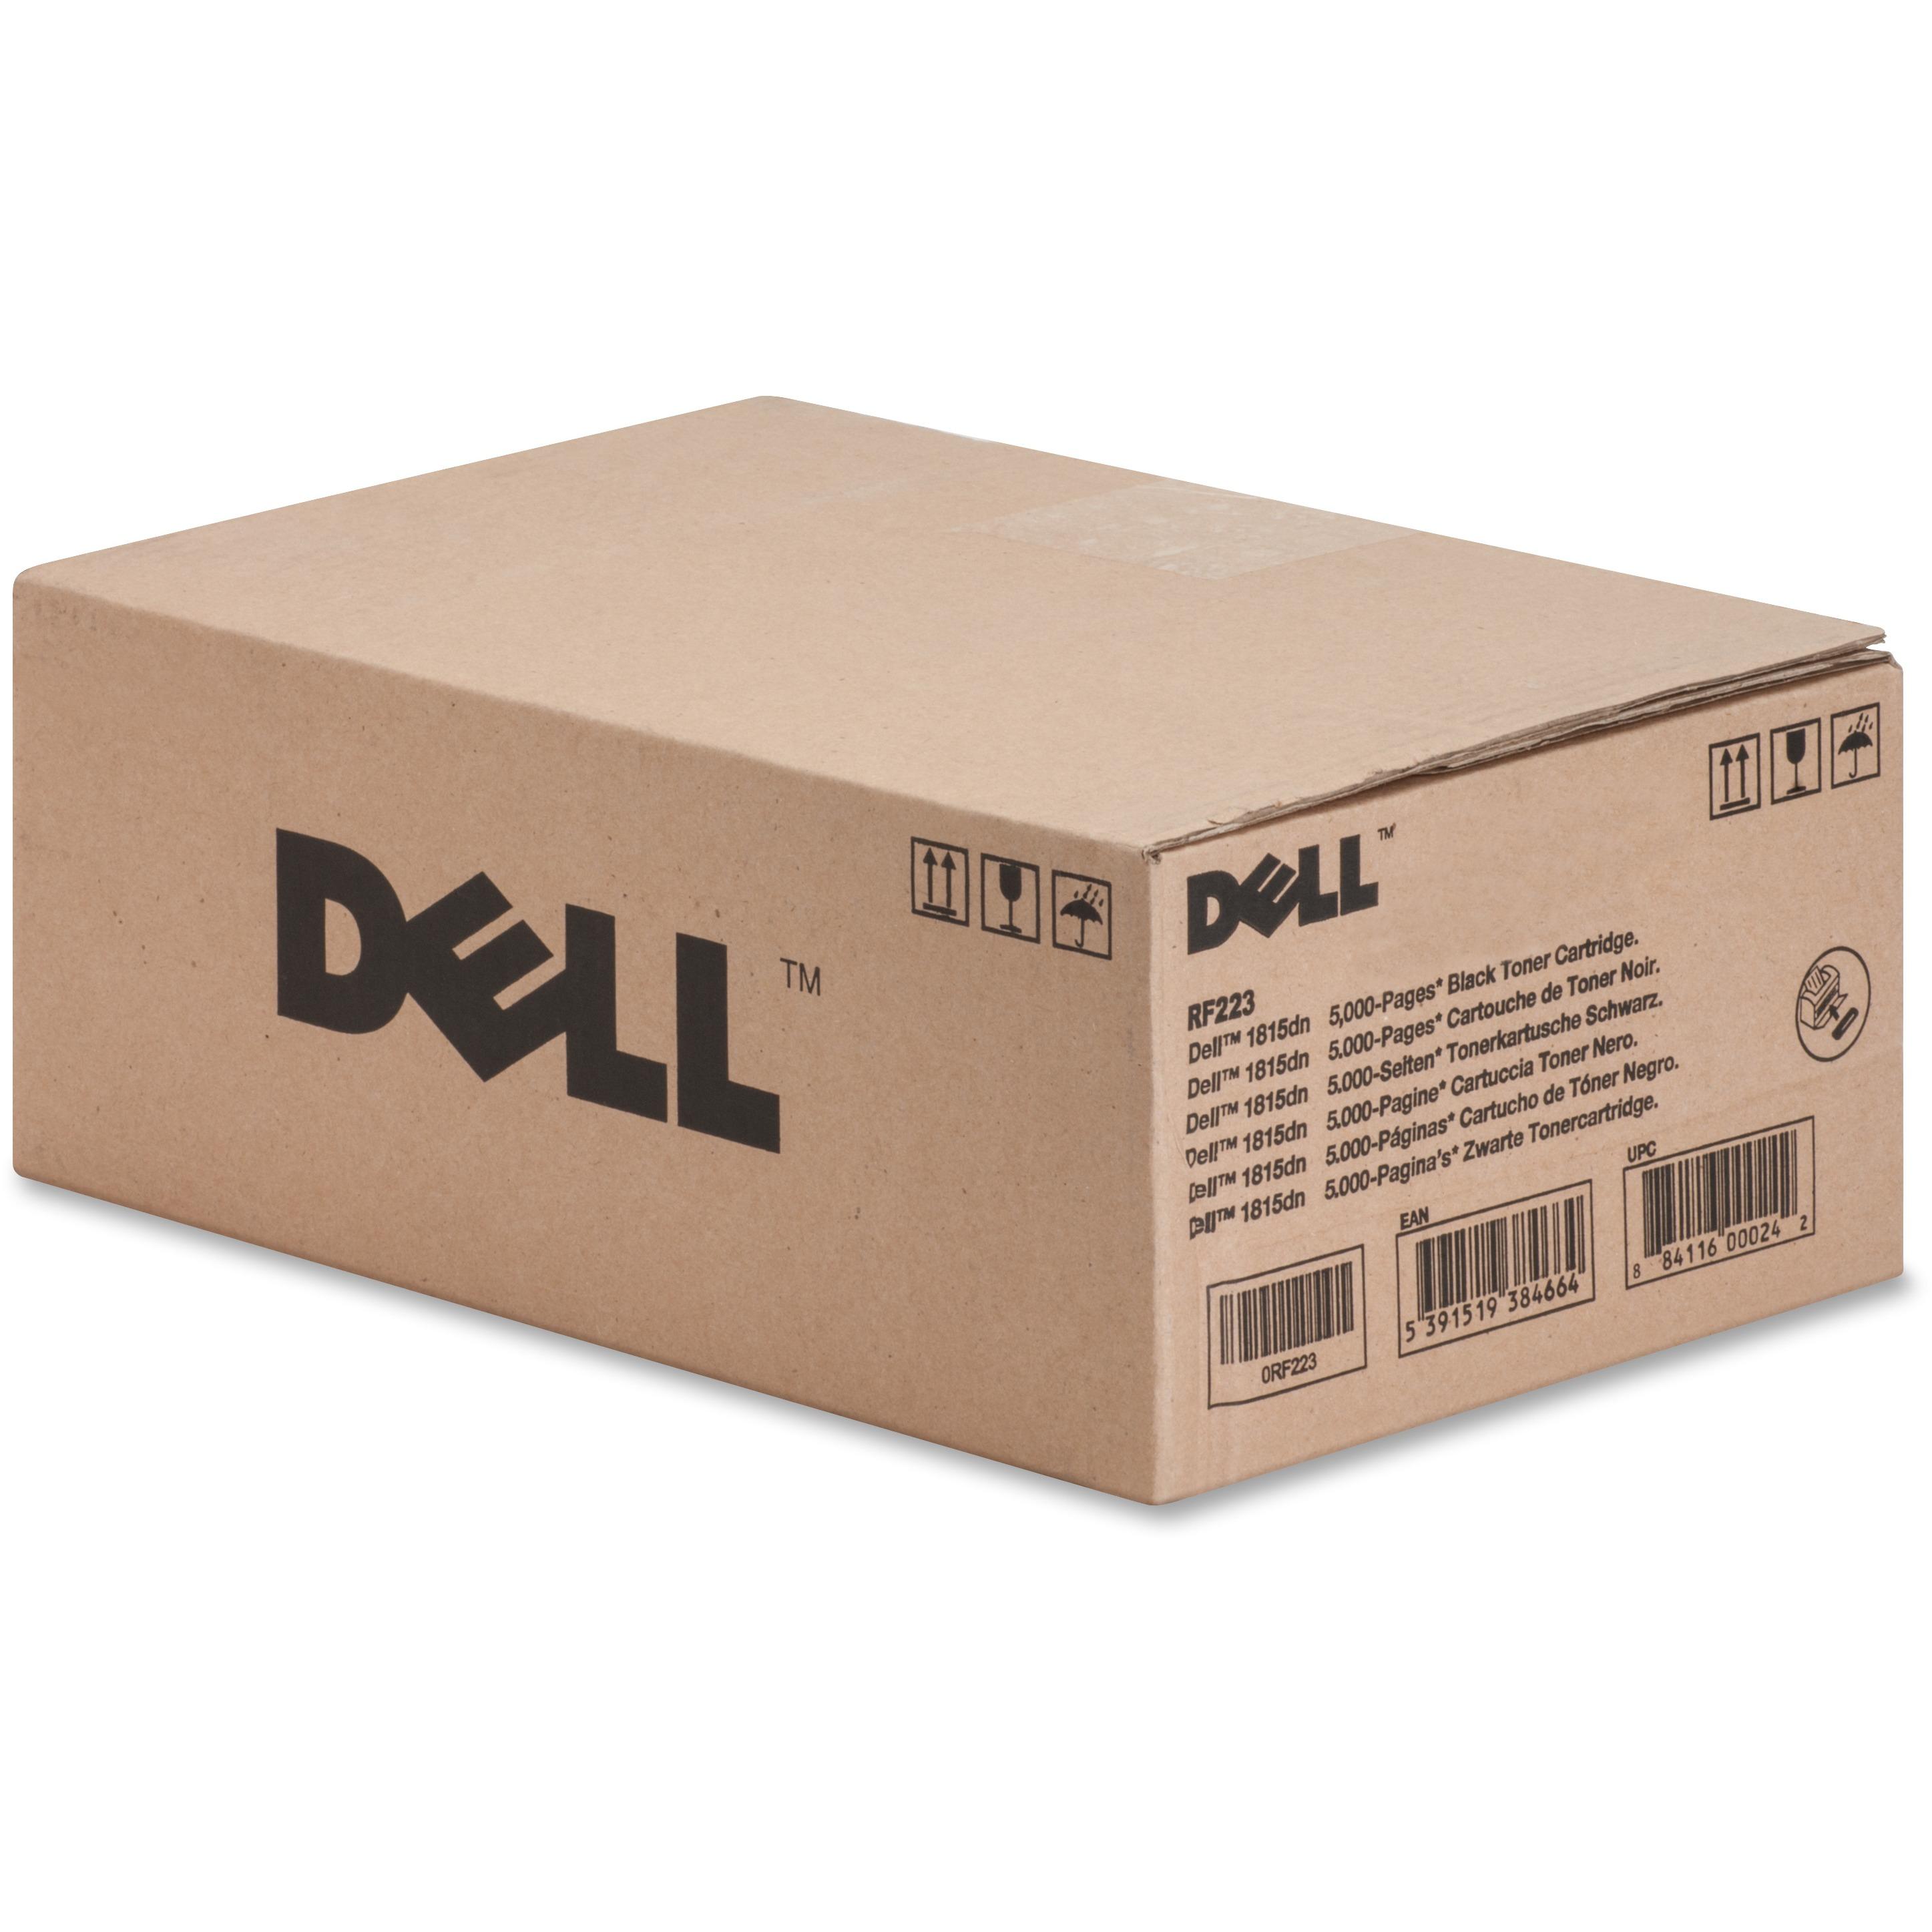 Dell, LLR69917, 1815DN High-yield Toner Cartridge, 1 / Each